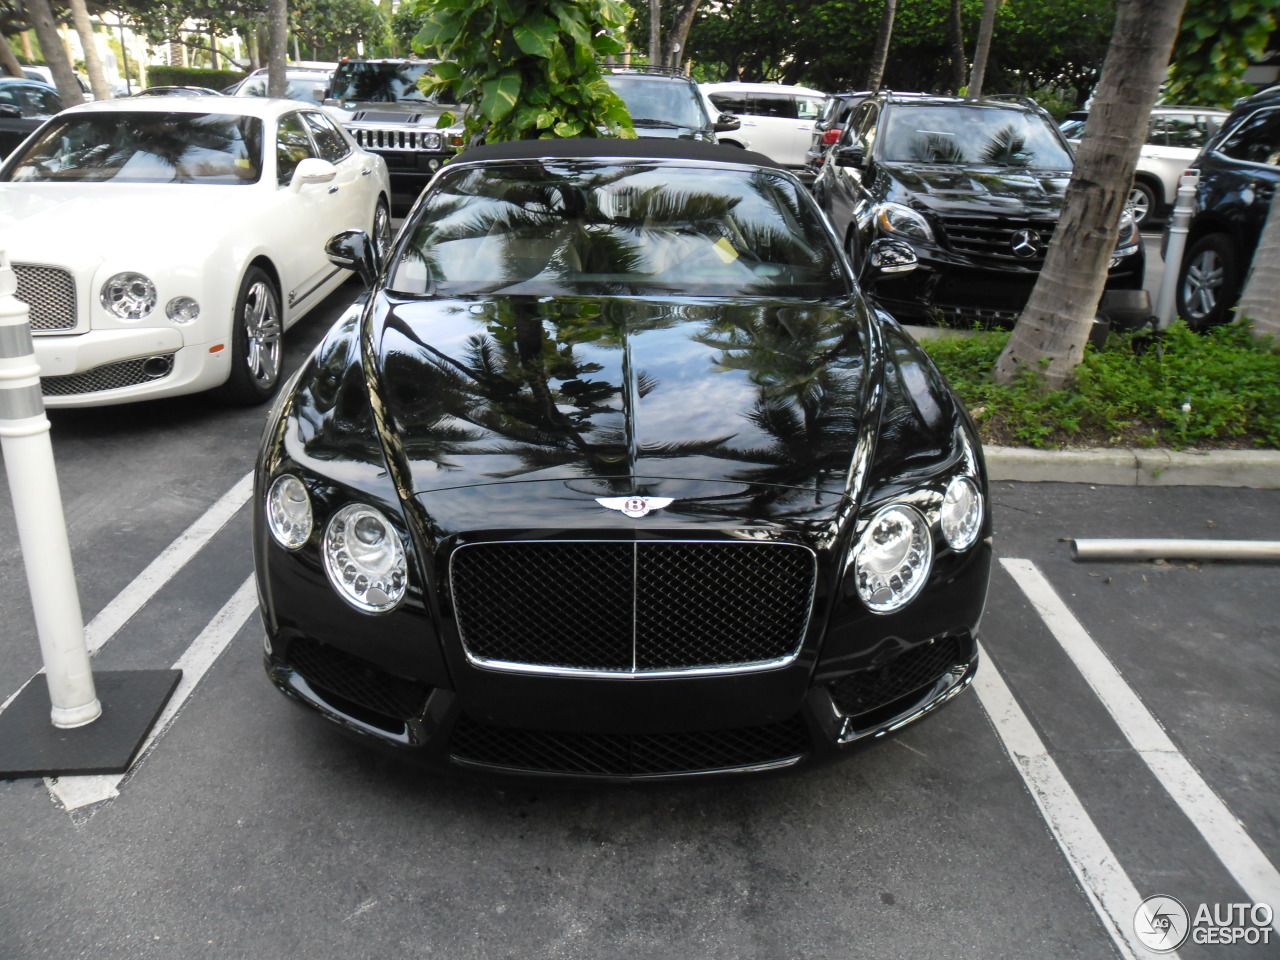 Bentley Continental Gtc V8 13 November 2013 Autogespot